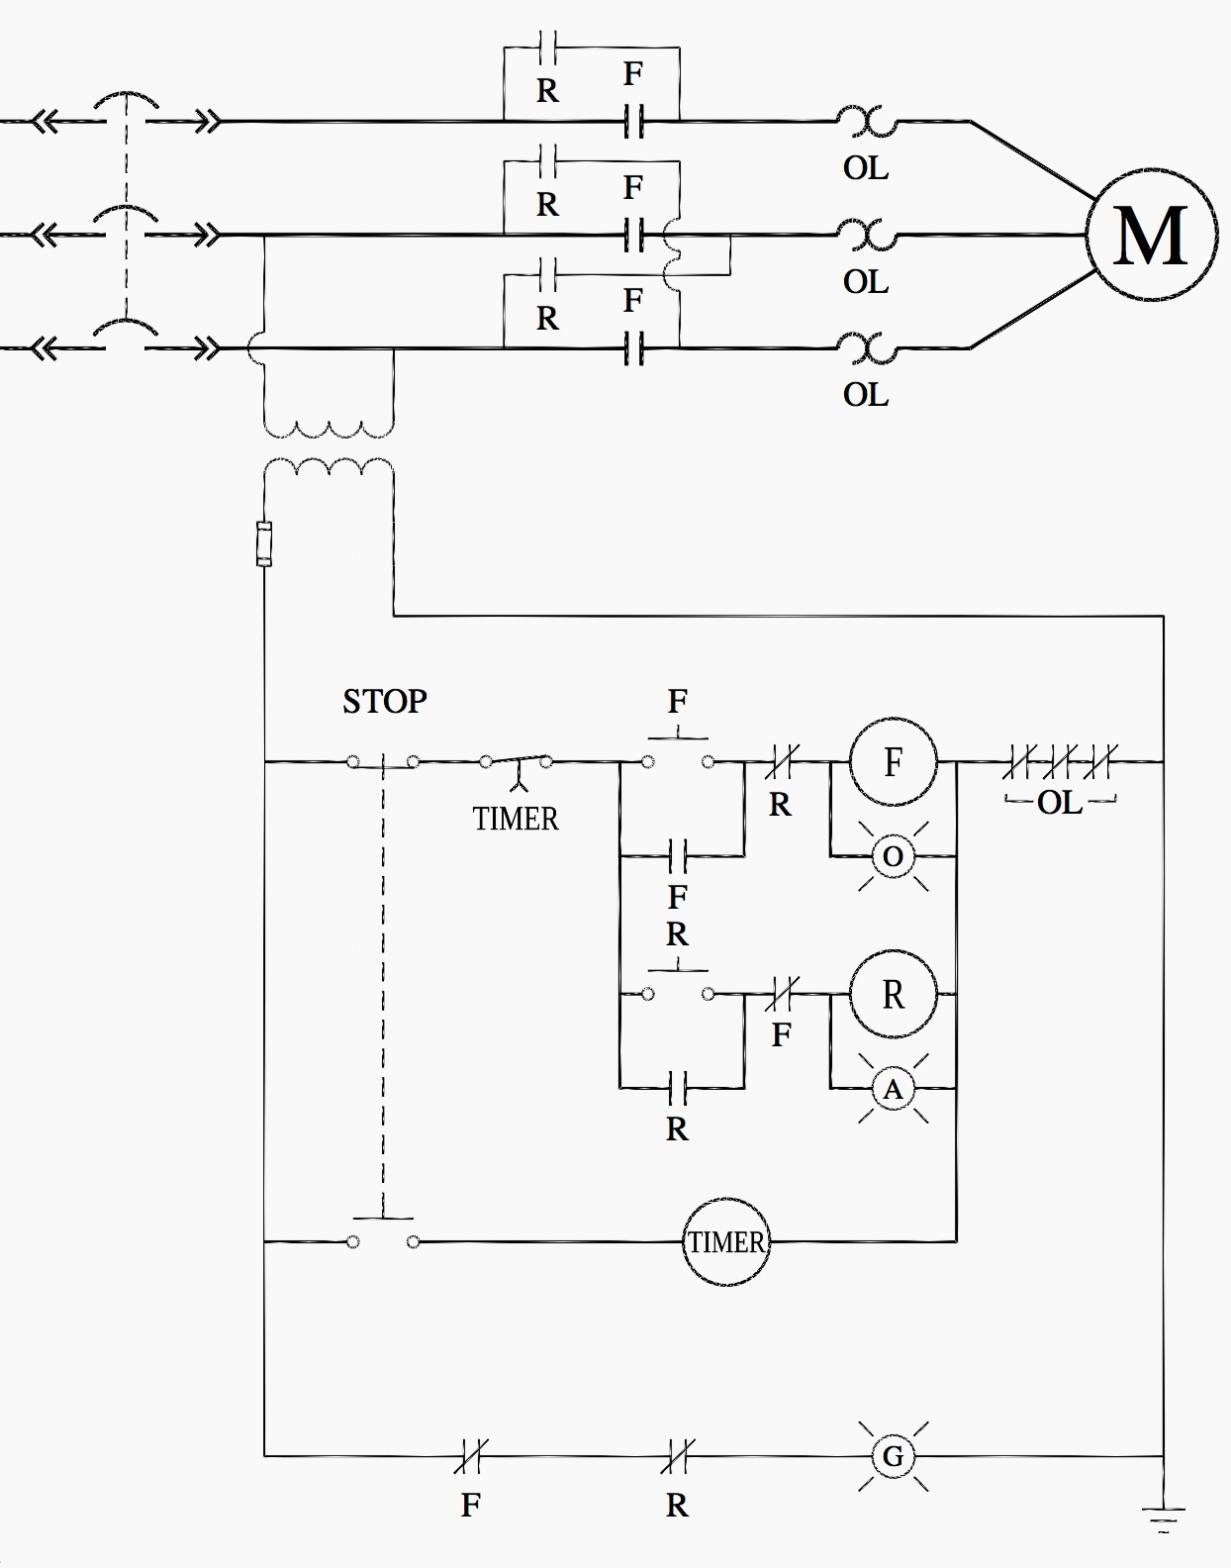 hight resolution of 1231x1568 ladder diagram symbols luxury control diagram symbols sketch electrical sketch